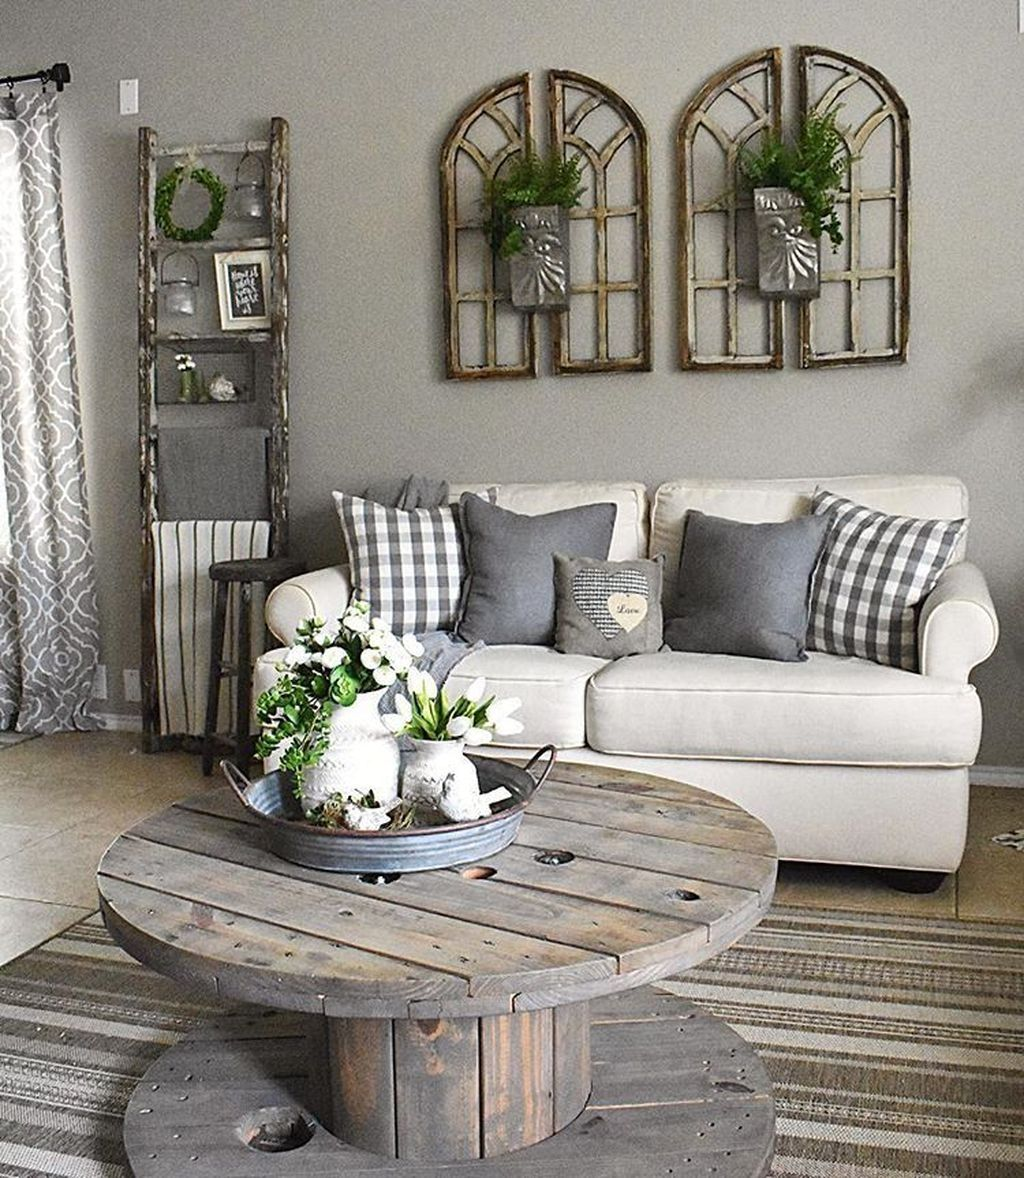 48 Modern Farmhouse Living Room Decor Ideas - Page 16 of ...